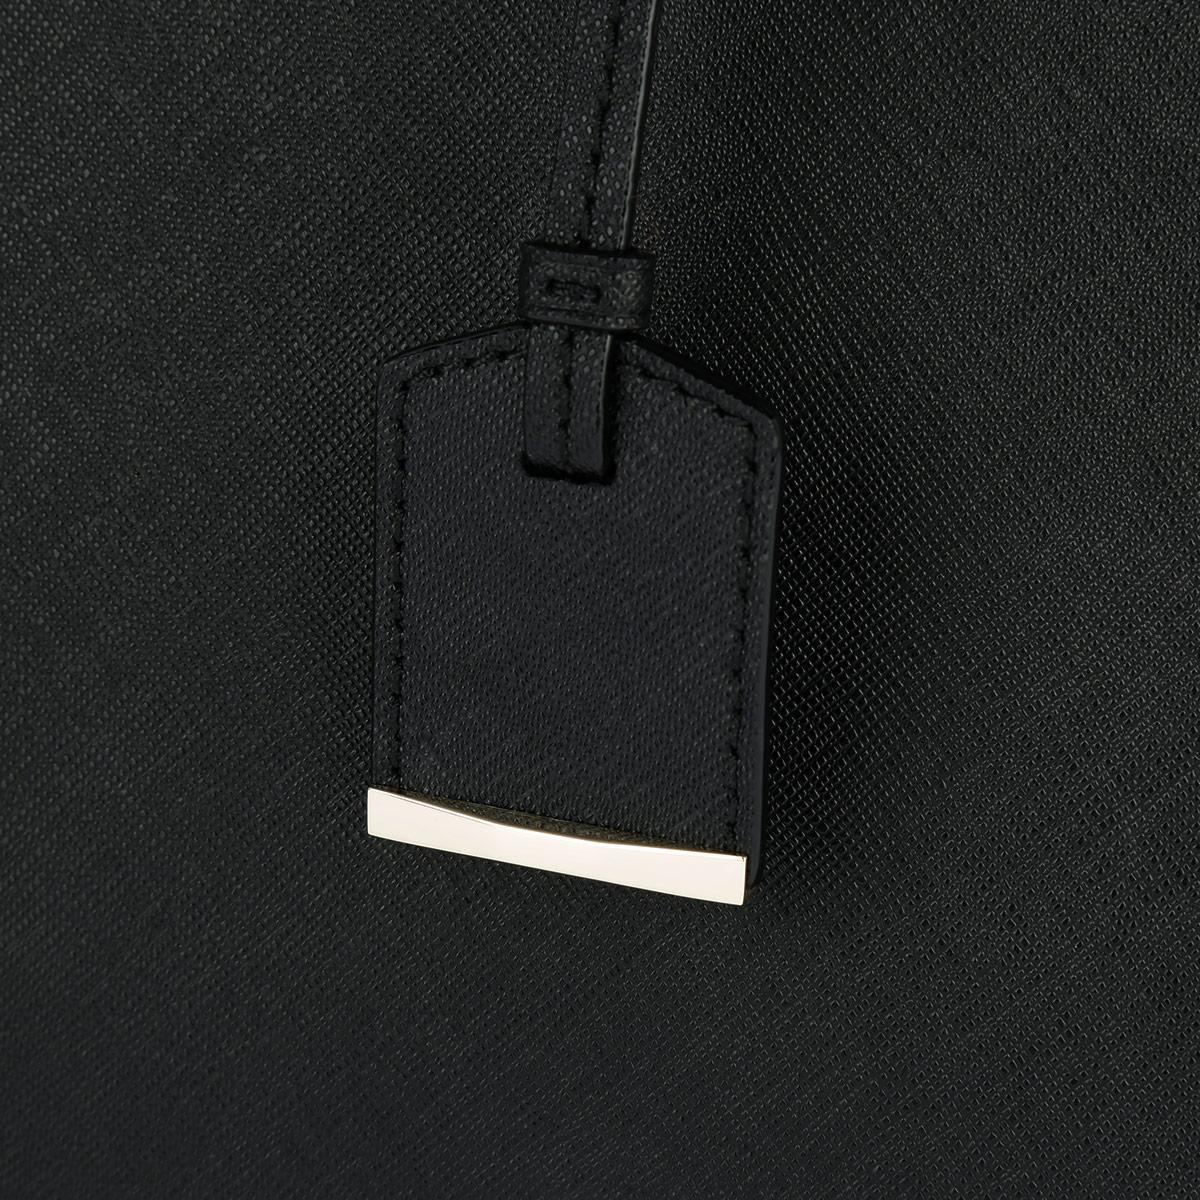 Kate Spade Leather Jensen Cameron Street Tote Black